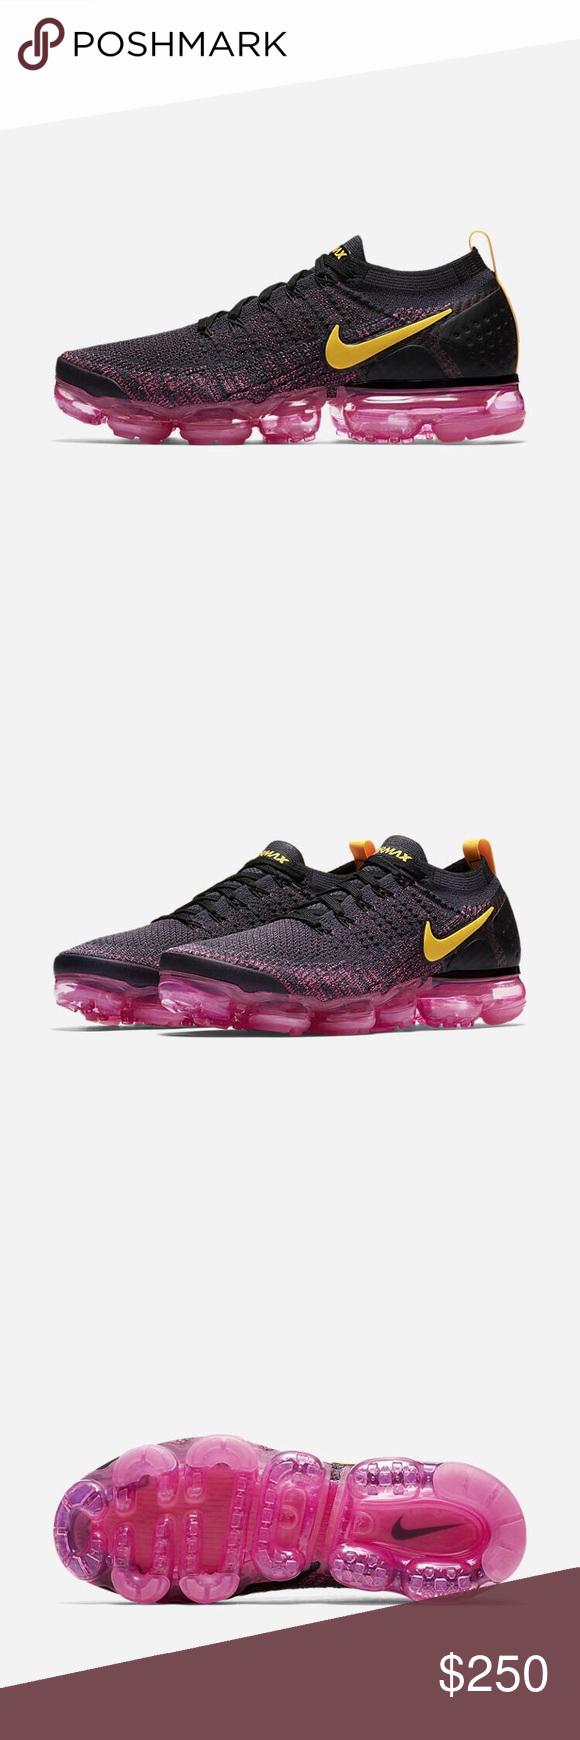 66f042777be52 Nike Air Vapormax Flyknit 2 Gridiron pink blast black laser orange Never  worn Nike Shoes Sneakers